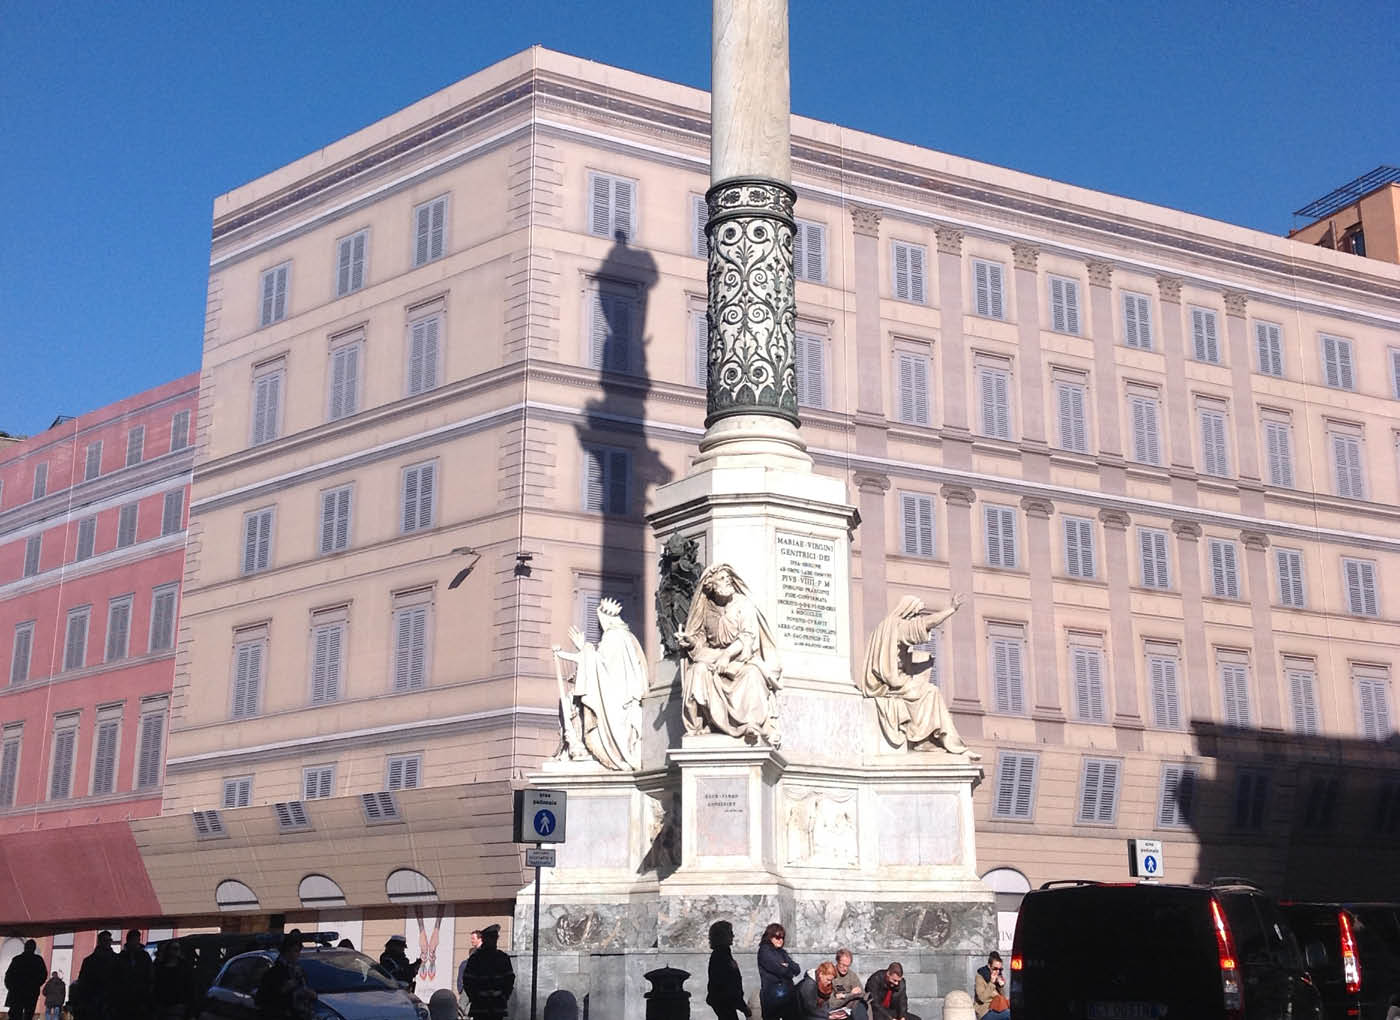 boutique-valentino-roma-consolidamento-solai-leca-cls-1400-1800-2